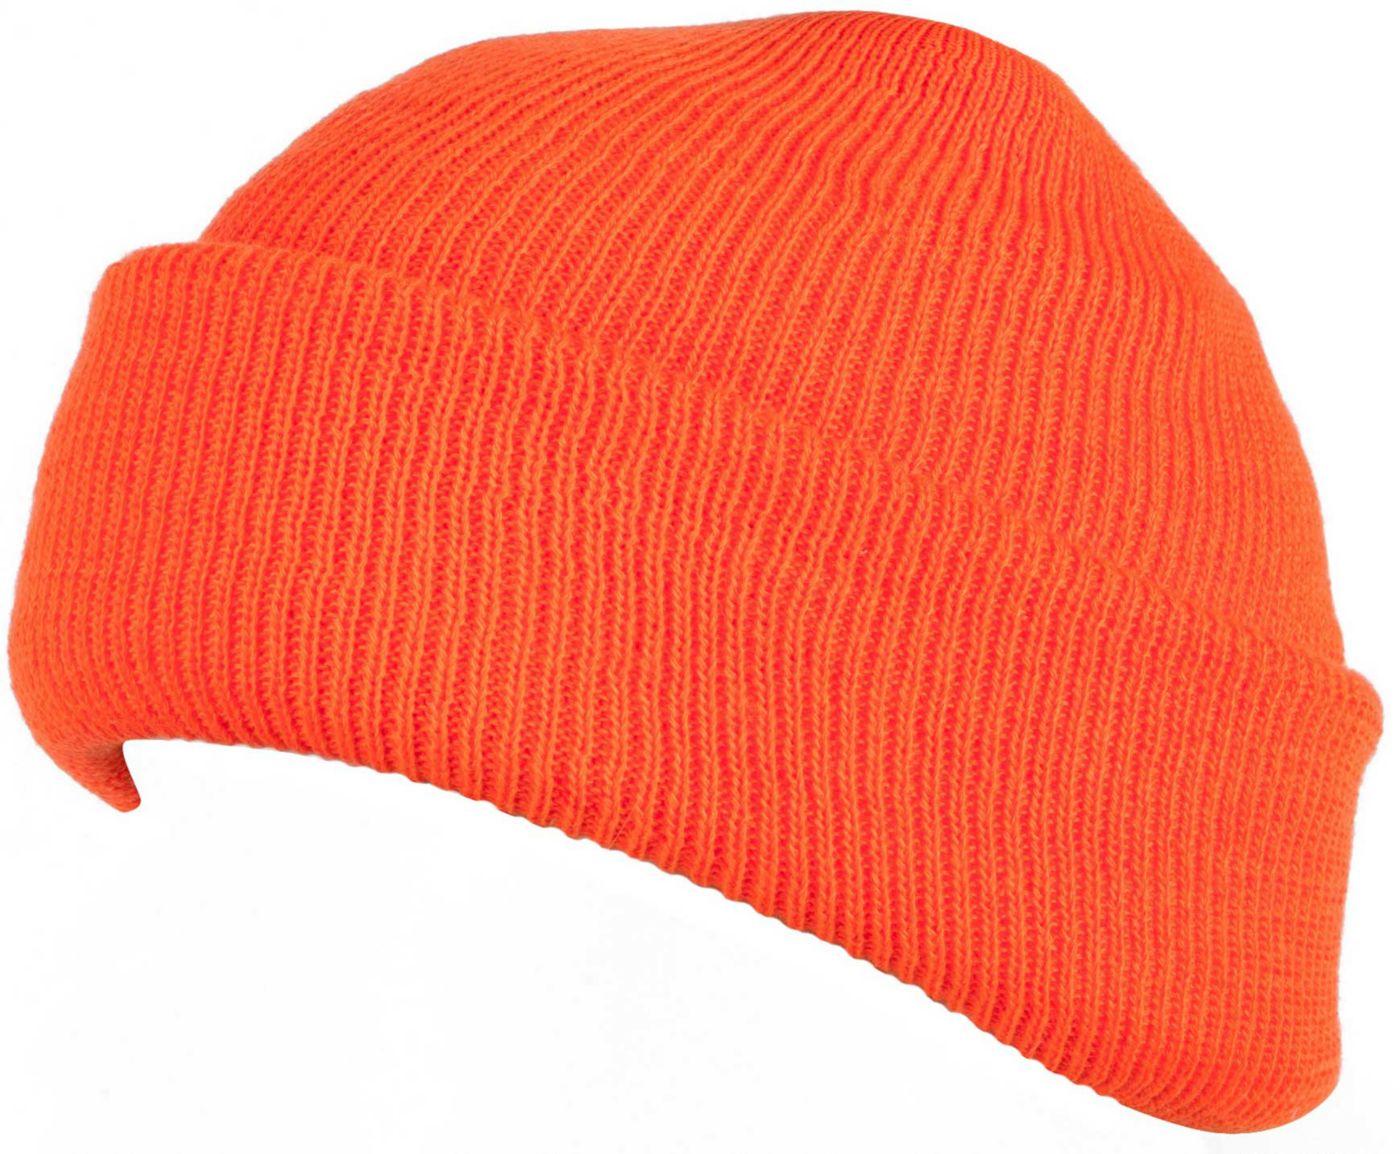 Reliable of Milwaukee Blaze Fat Cap